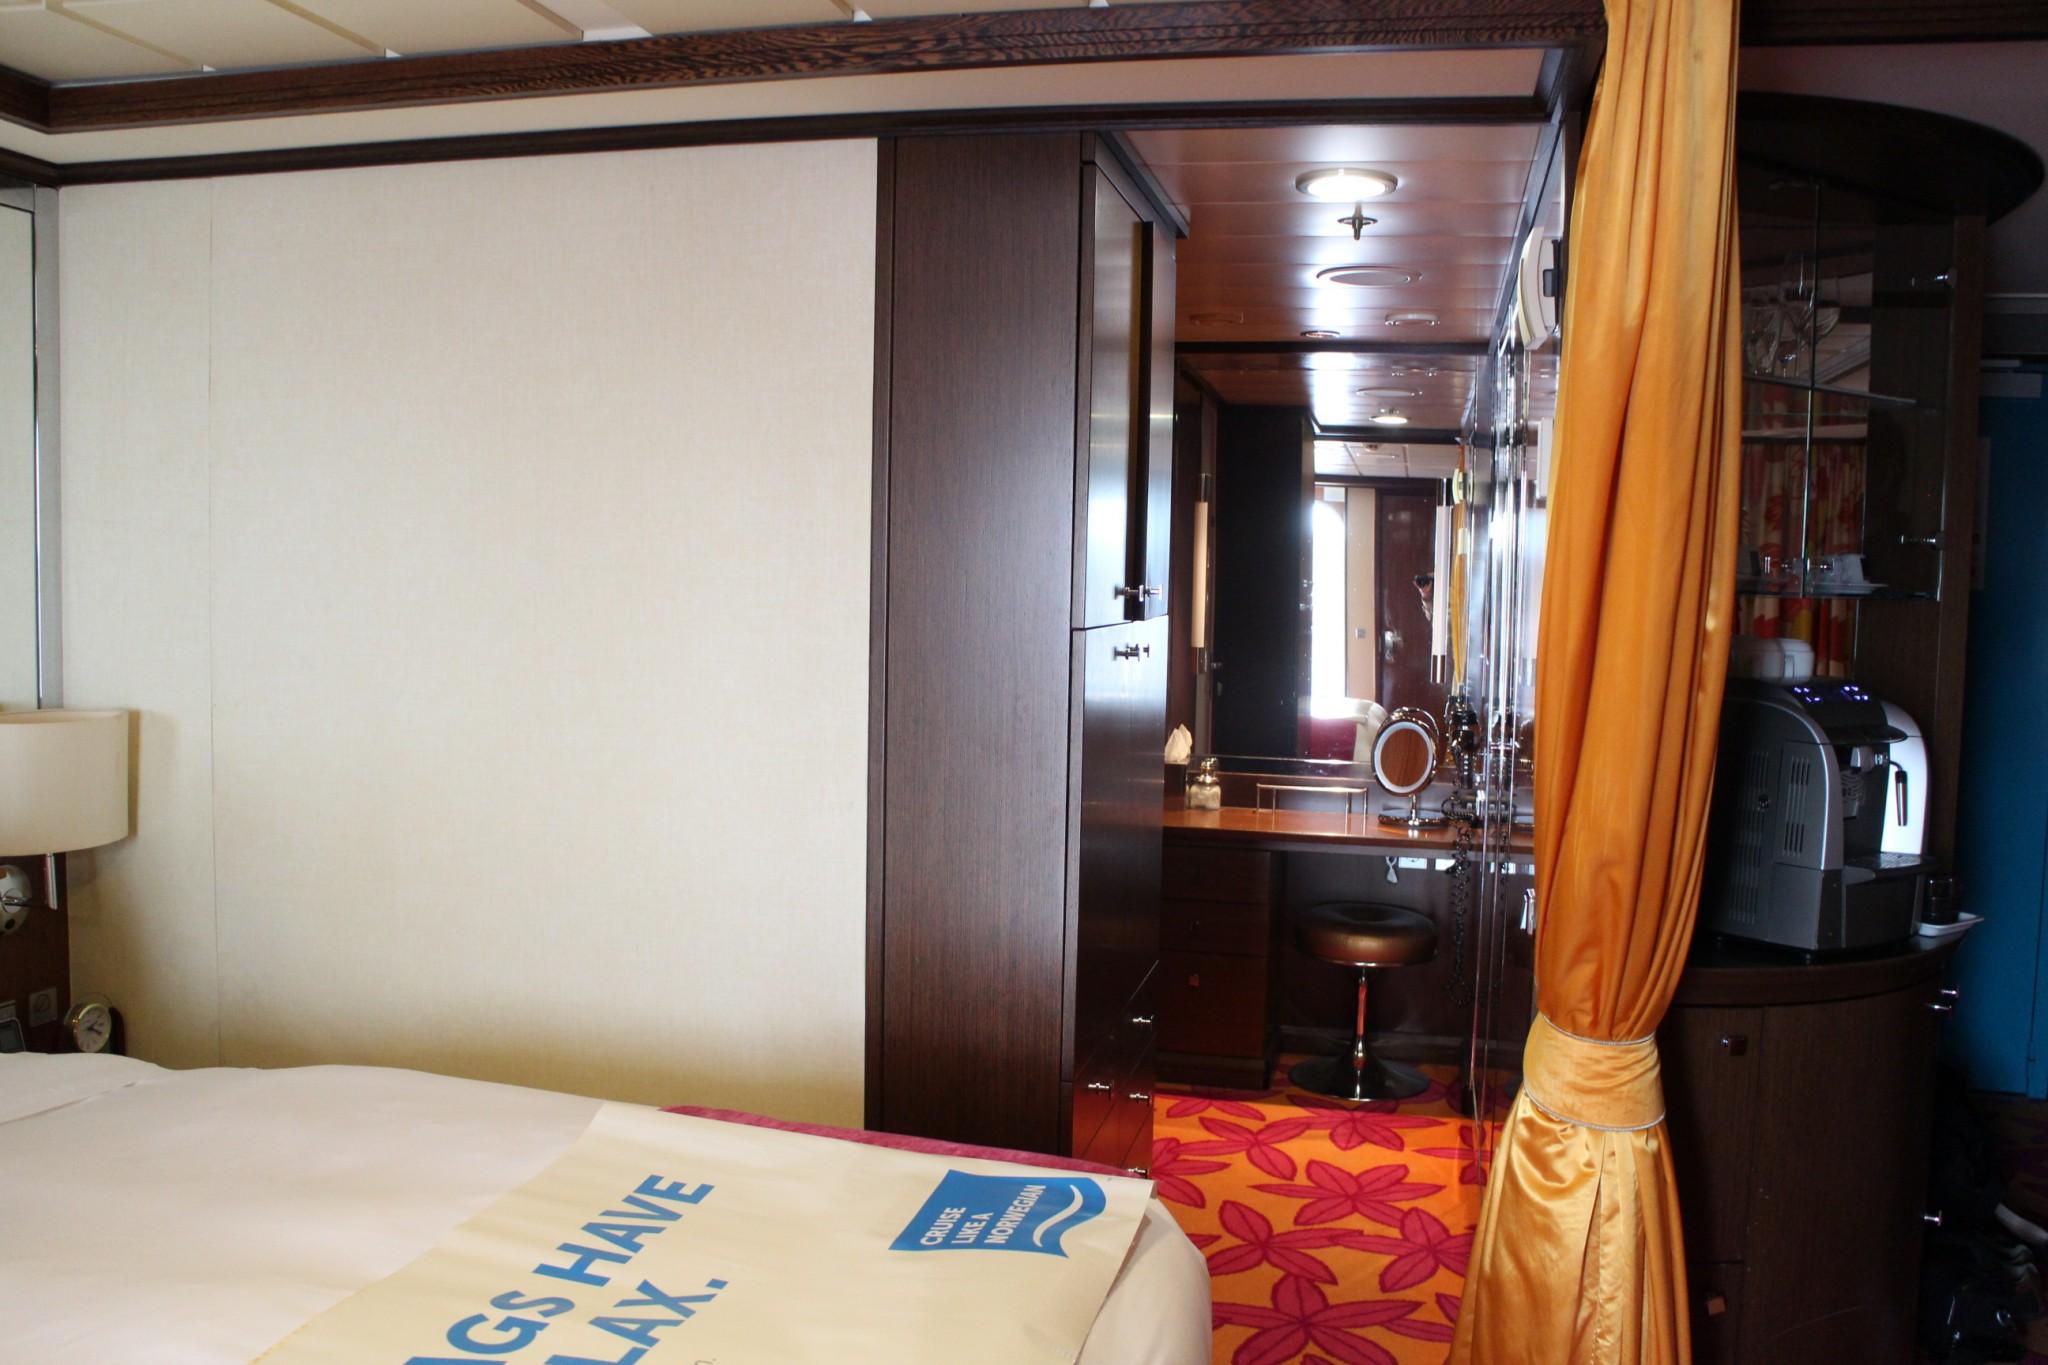 Norwegian Jewel Forward Penthouse with Large Balcony dressing area